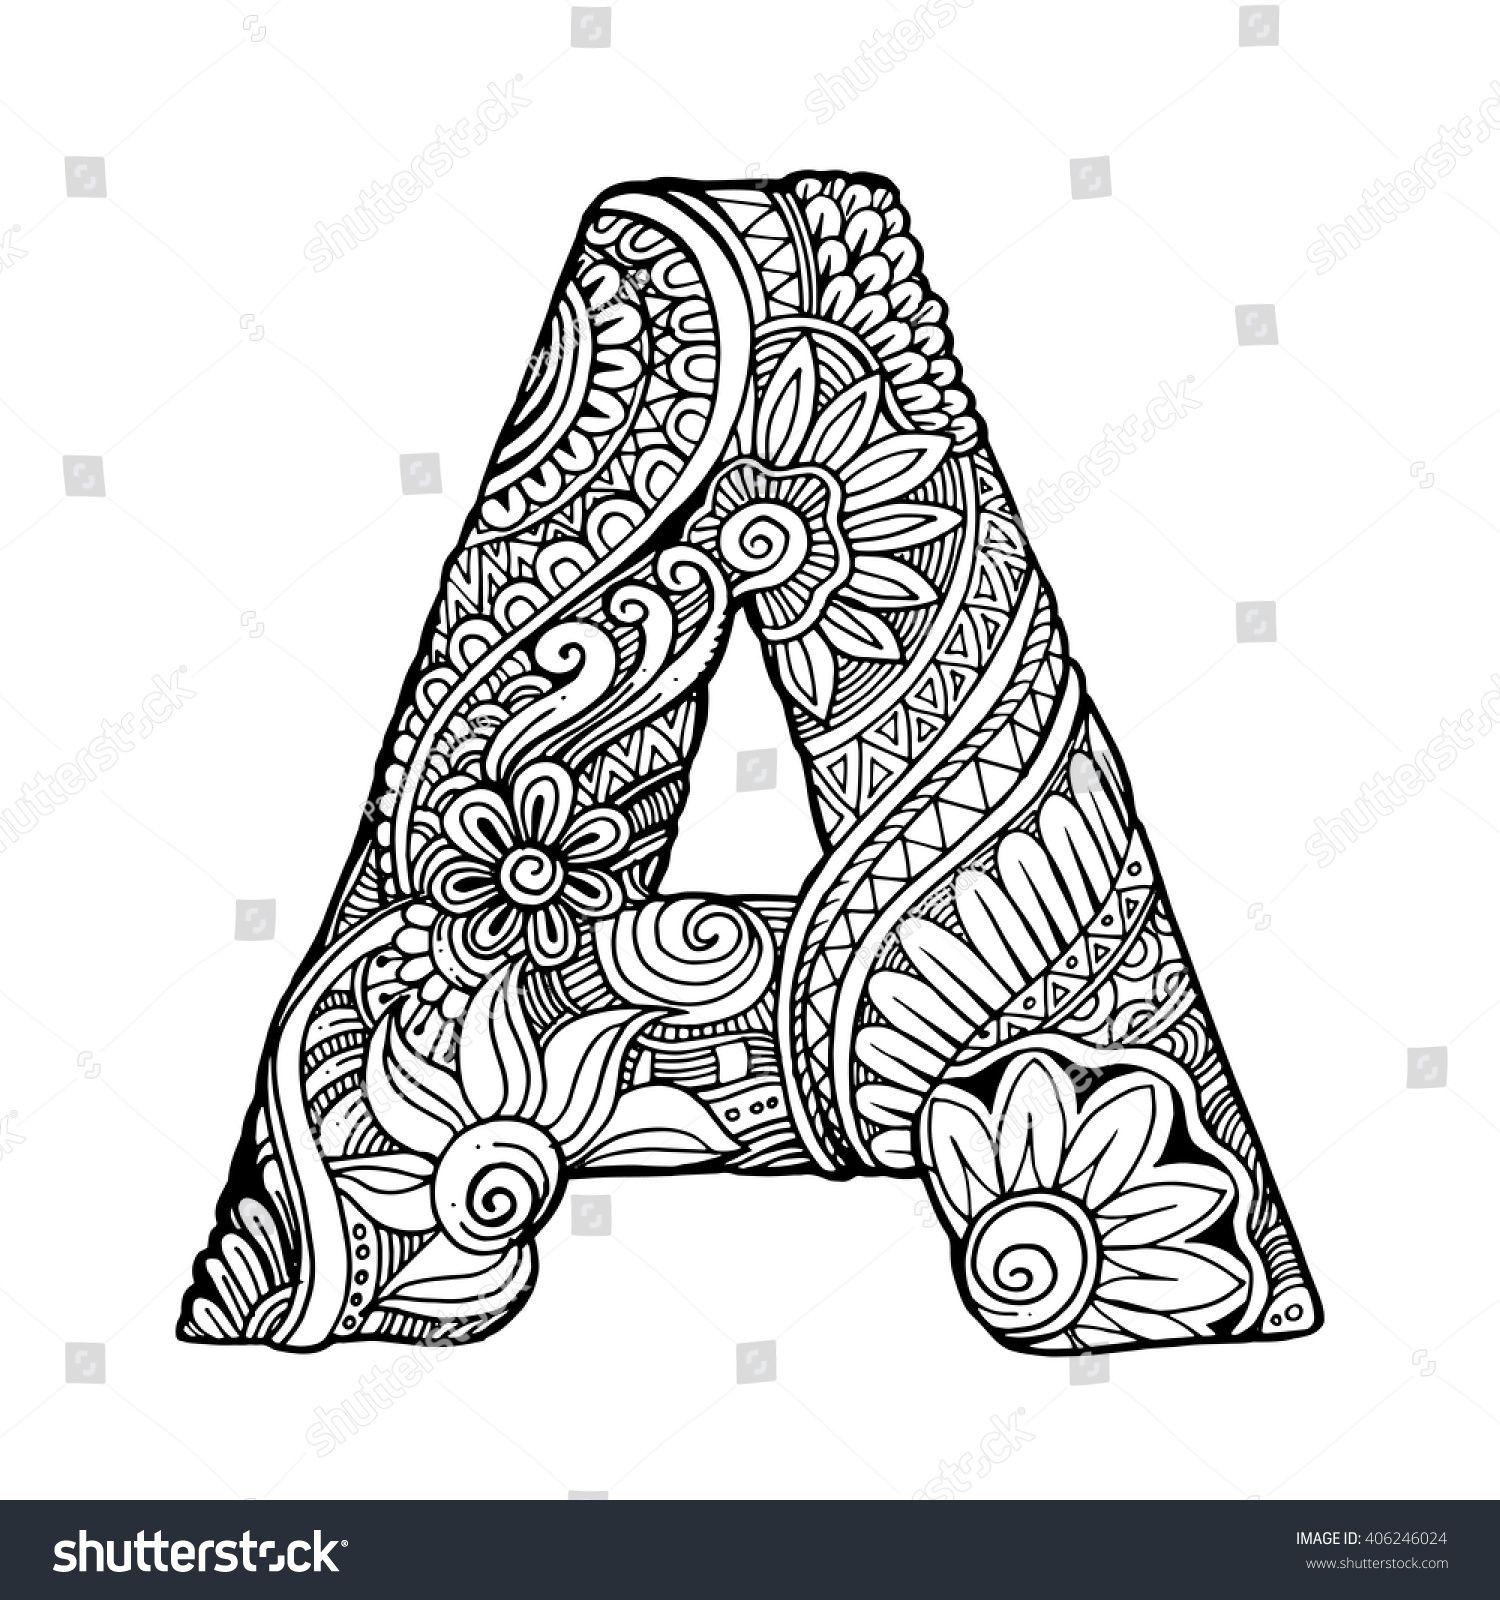 Zentangle Stylized Alphabet Letter A Vector